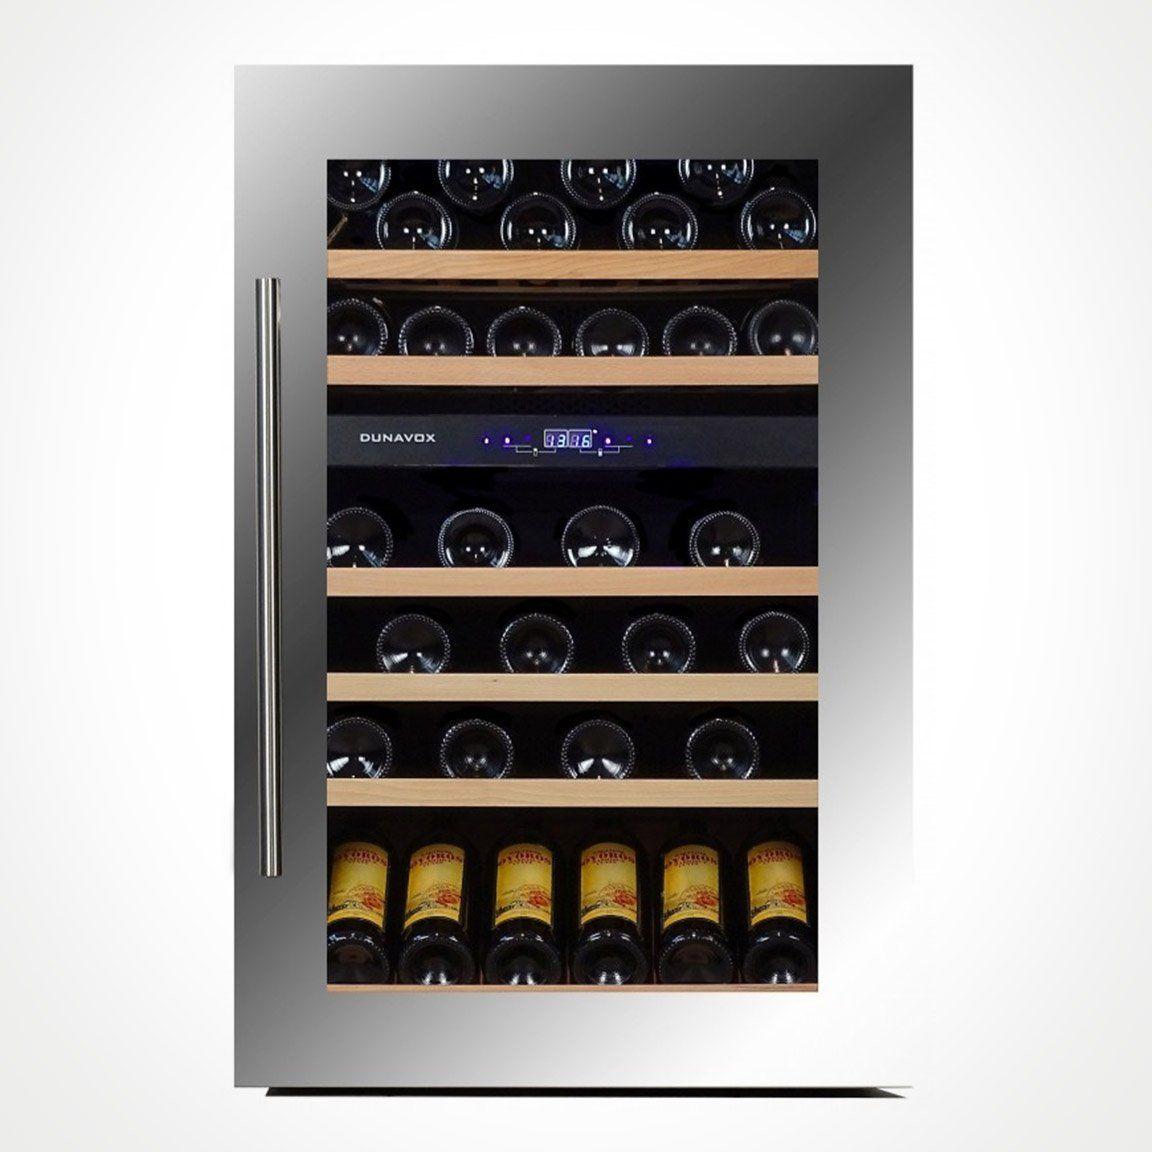 Vyno Saldytuvas Dunavox Dx 57 146dsk Daneka Lt Https Www Daneka Lt Collections Dunavox Products Vyno Sald Wine Fridge Dual Zone Wine Fridge Wine Cabinets